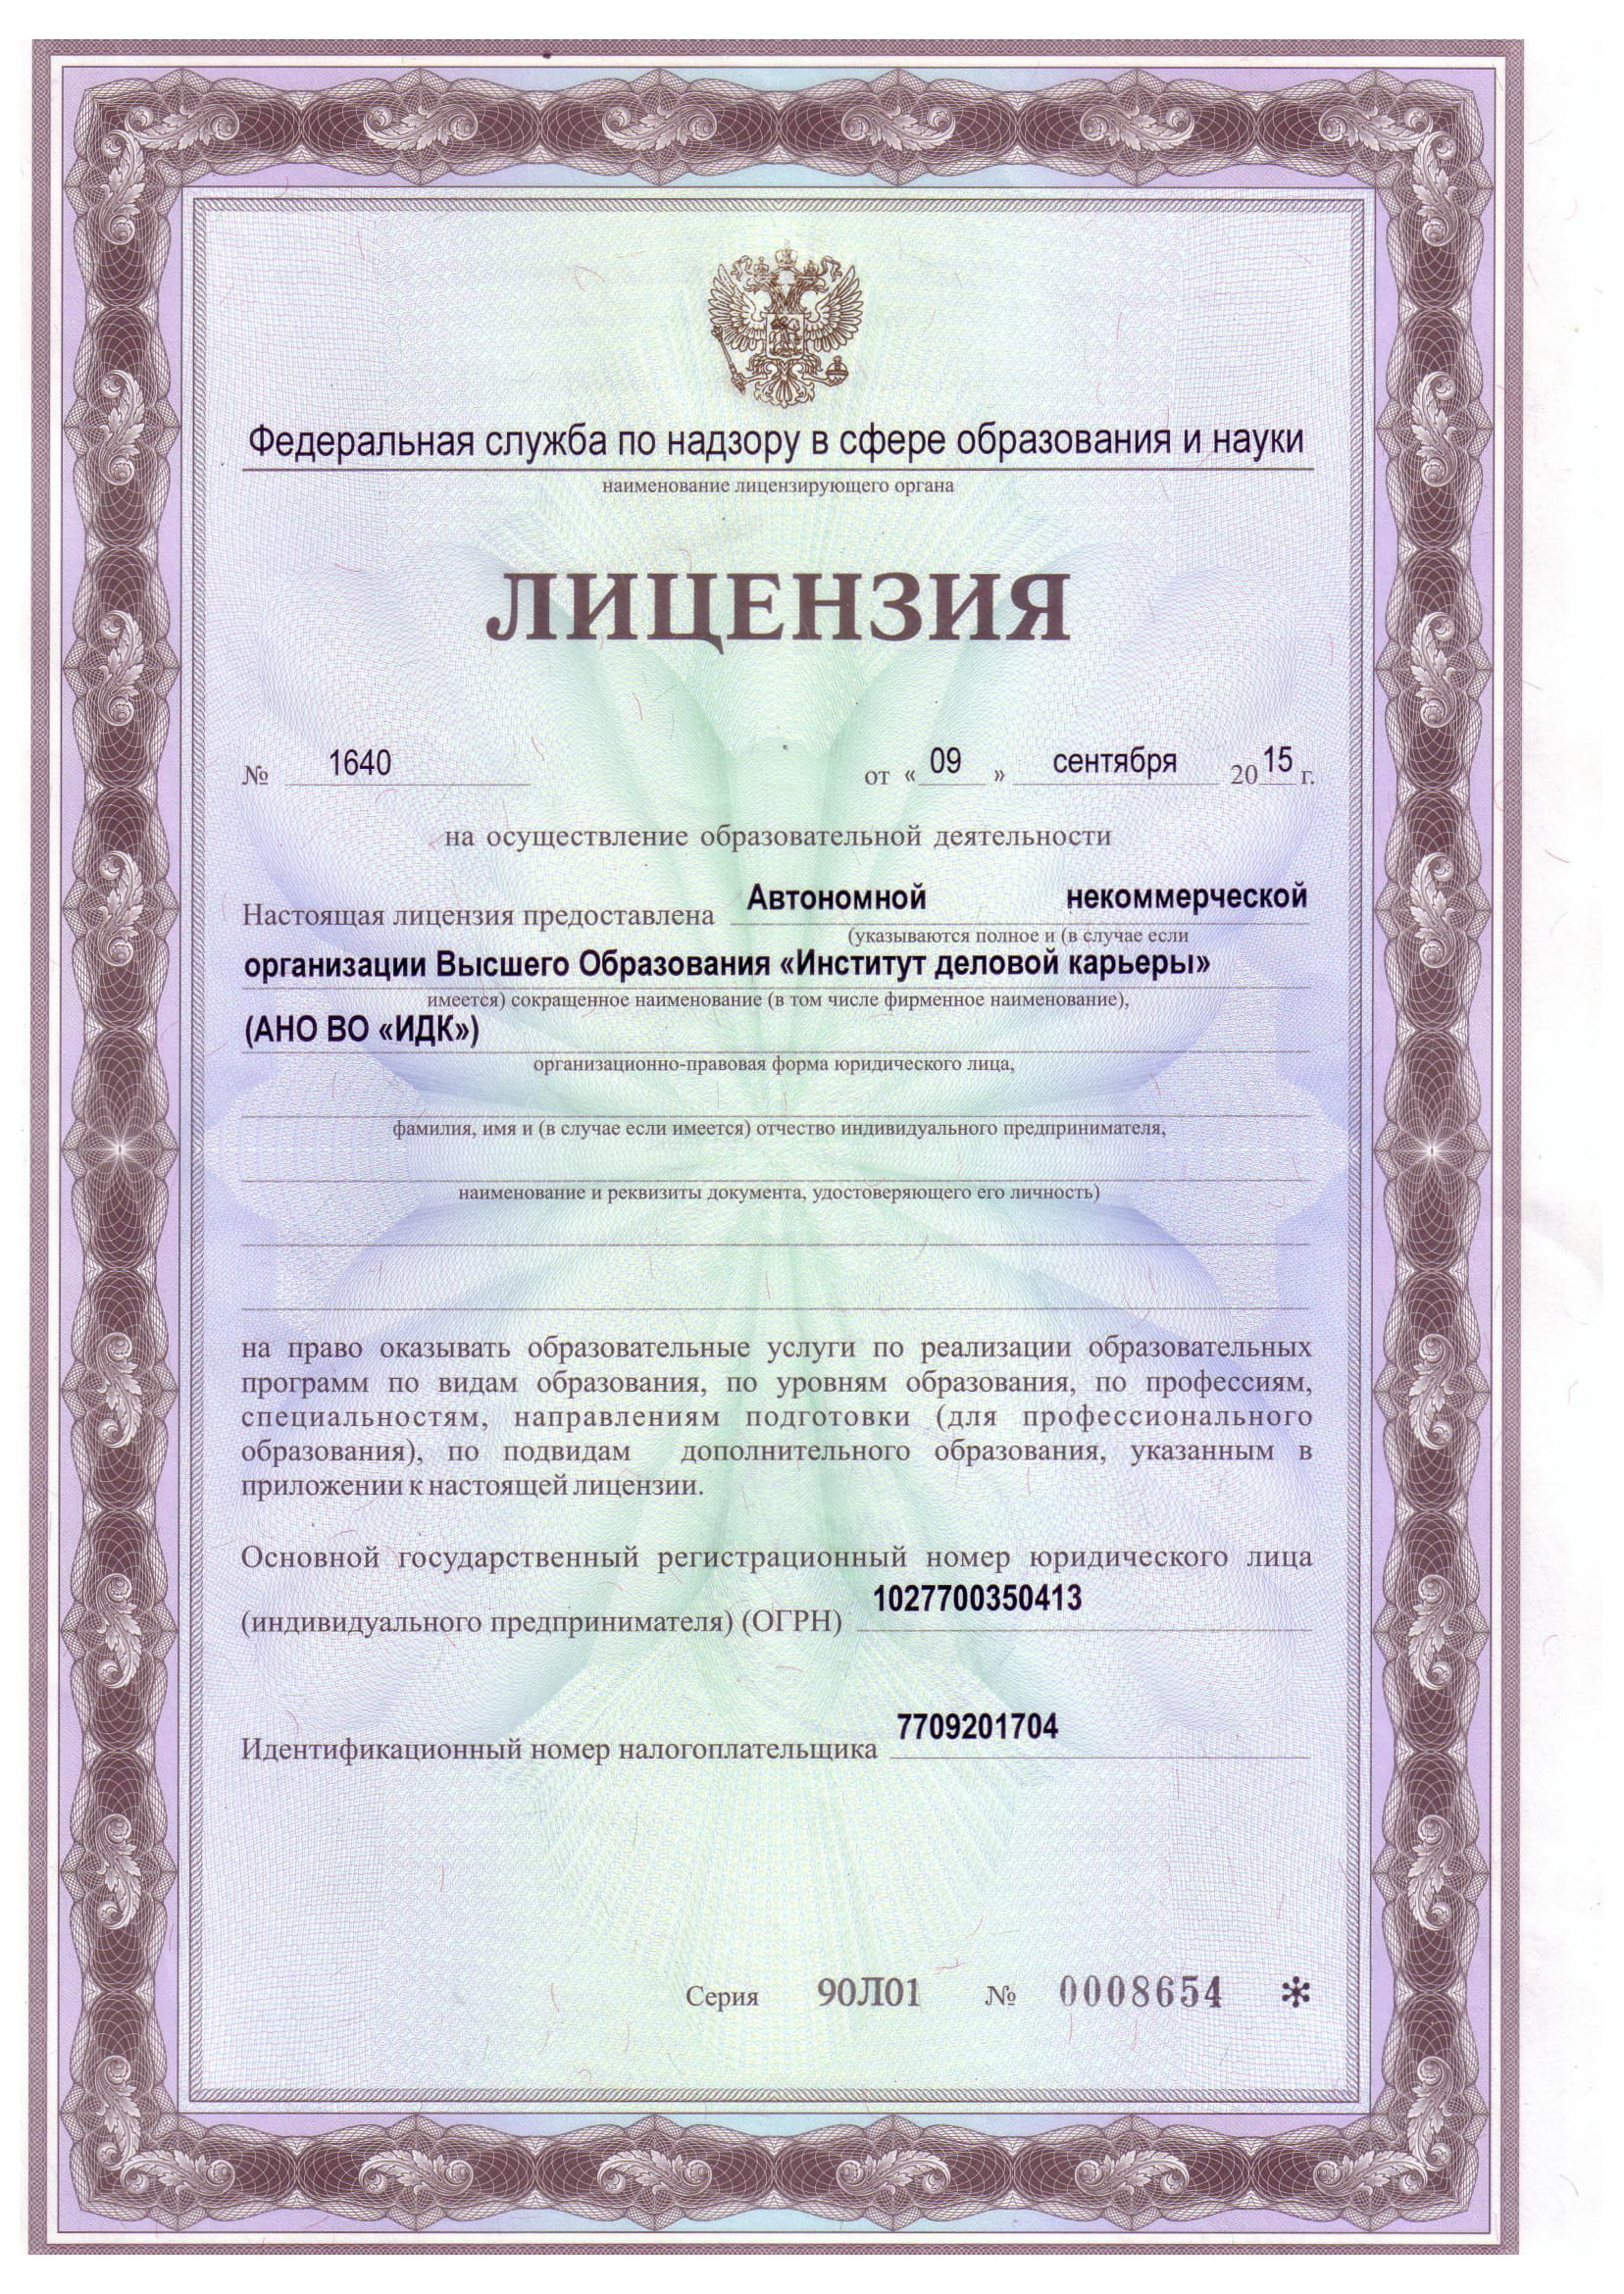 http://departamentvpo.ru/wp-content/uploads/2017/04/licenzia_s_prilosheniem-1.jpg